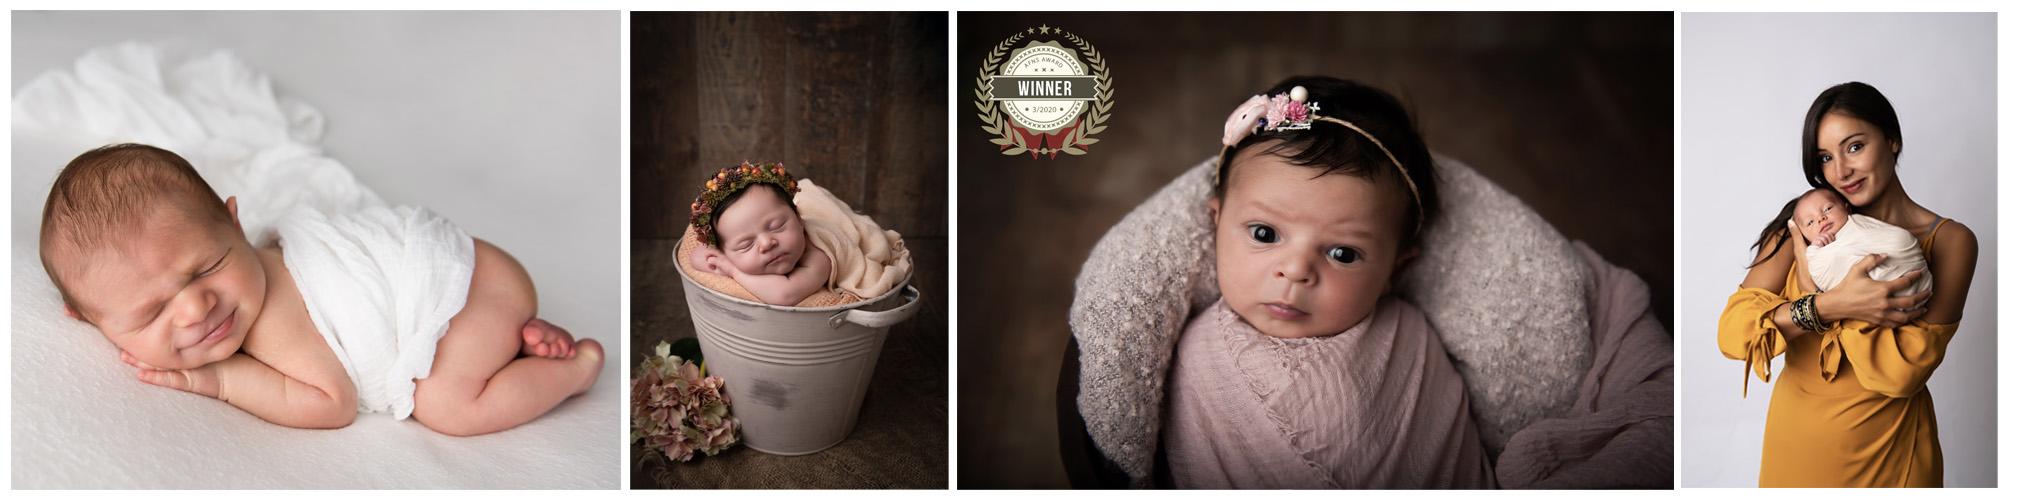 photographe naissance Aix marseille